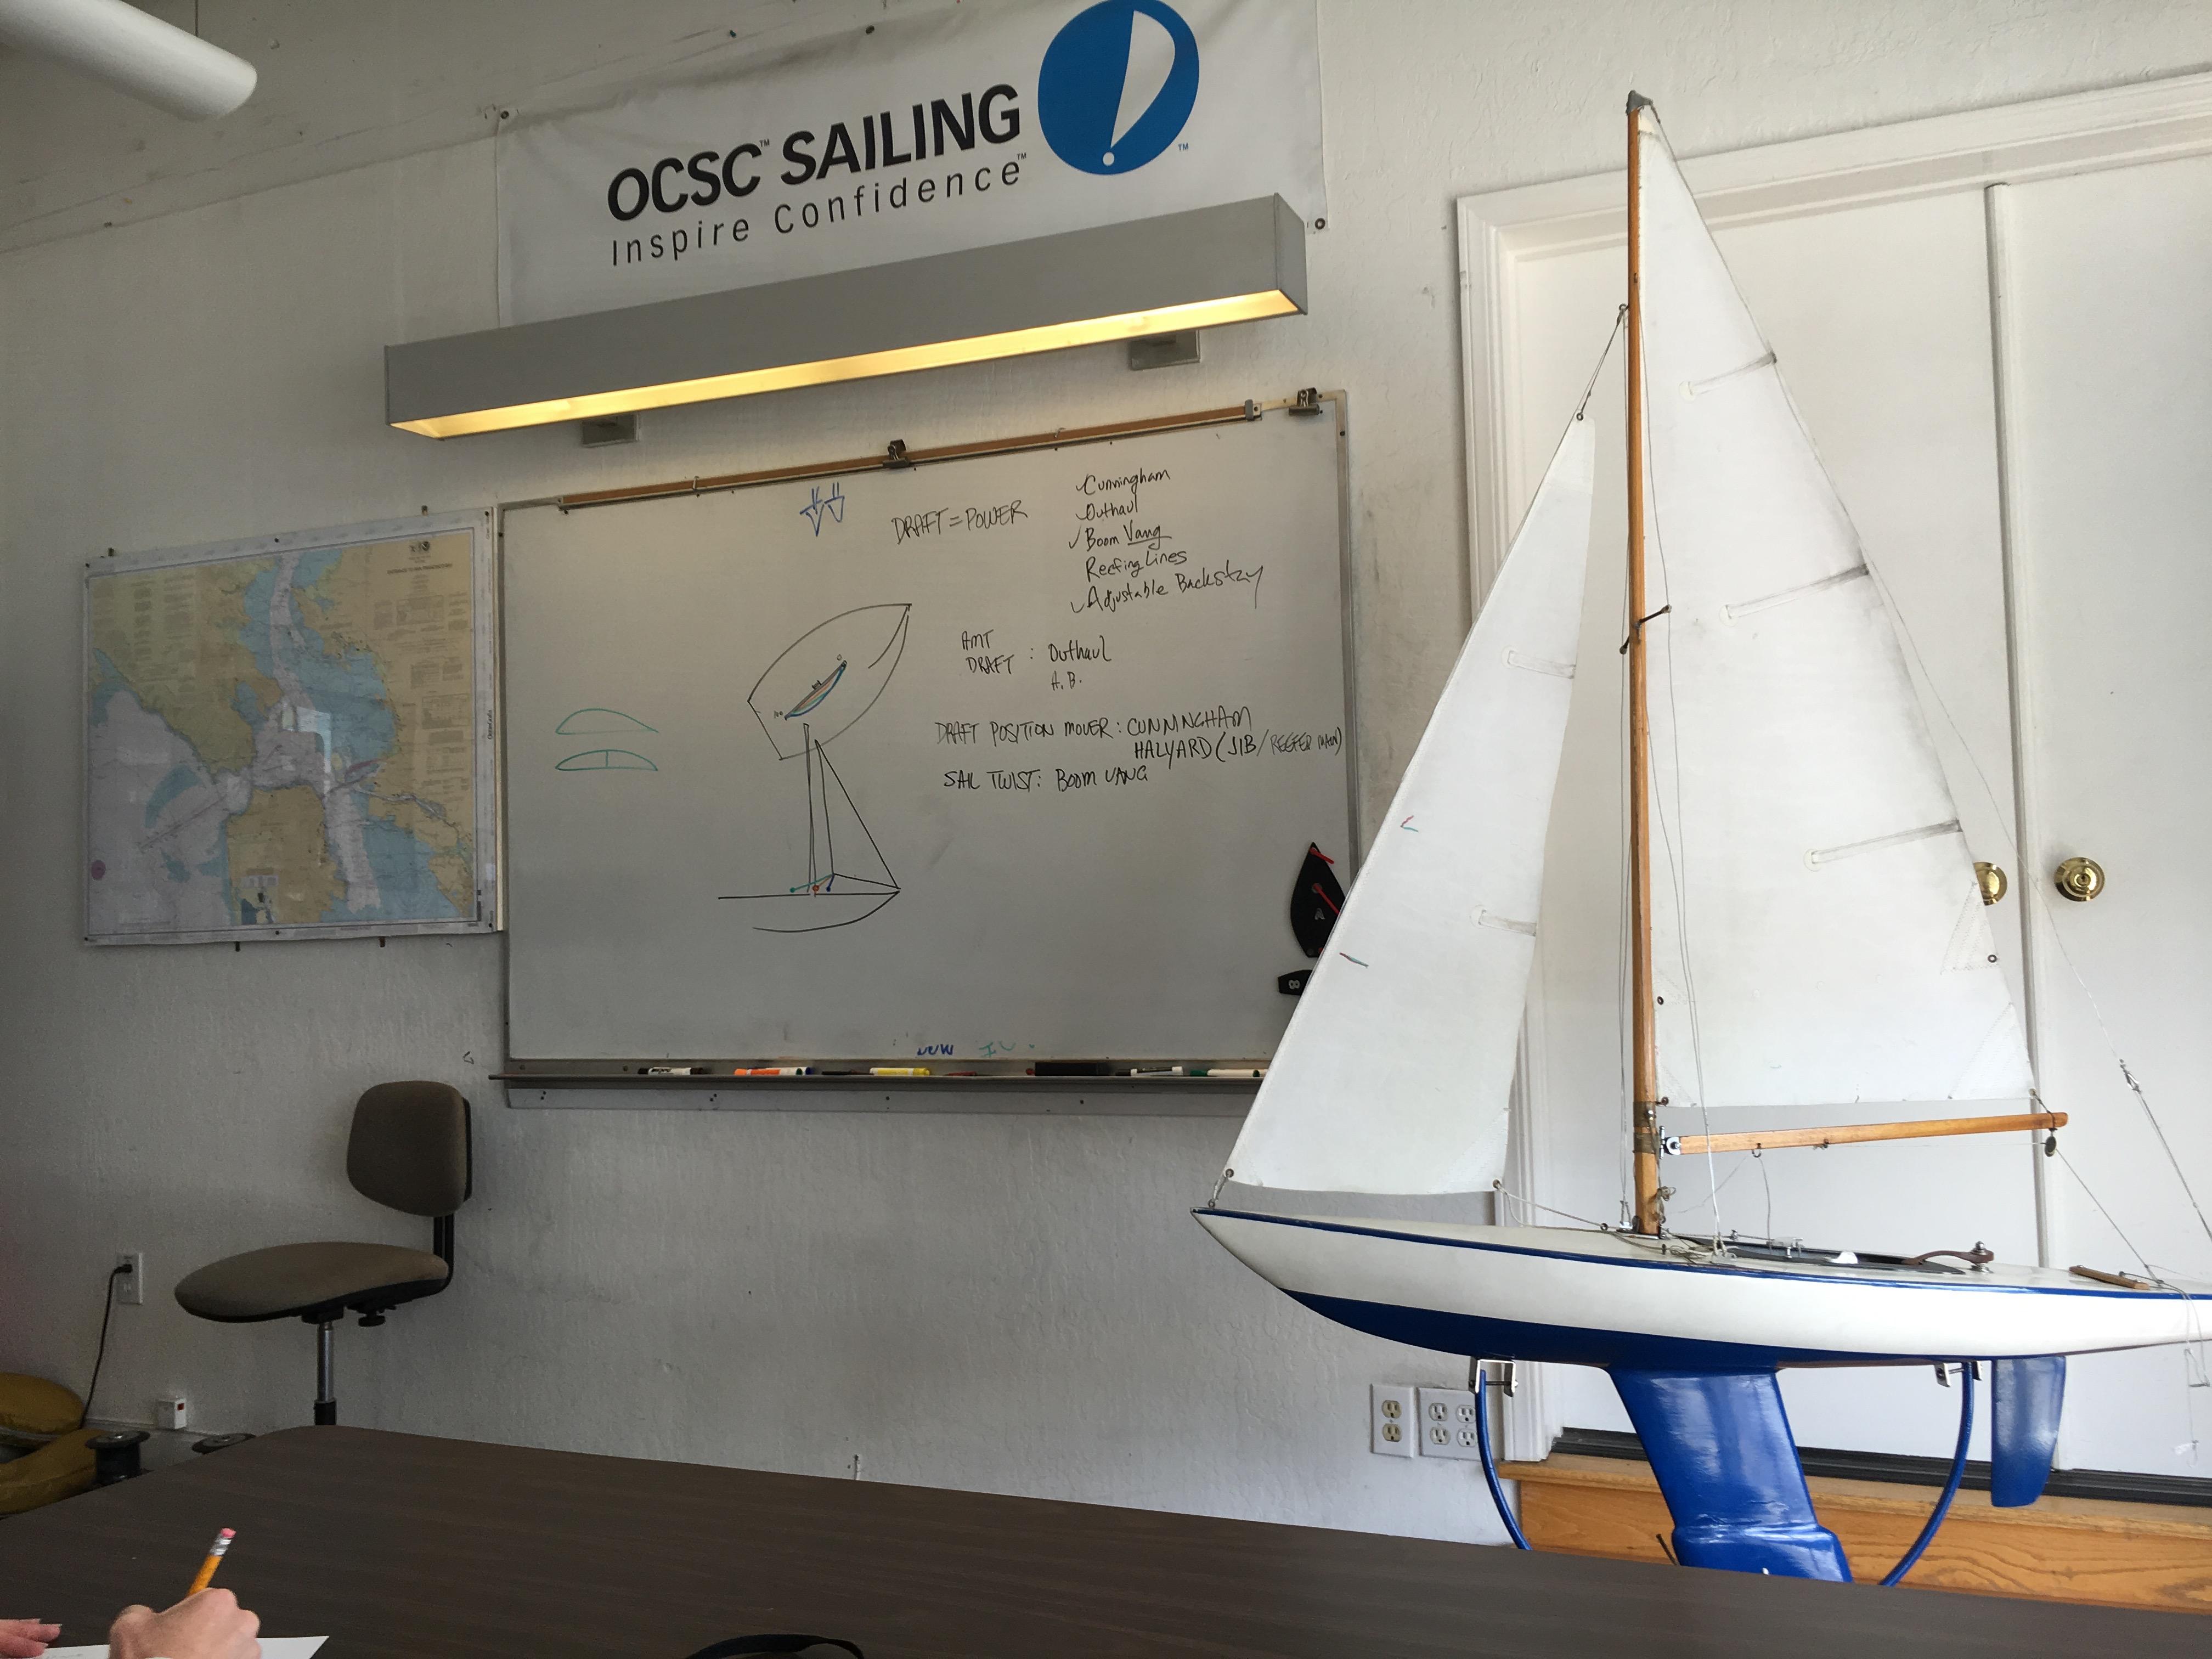 Classroom at OCSC Sailing School in Berkeley, California